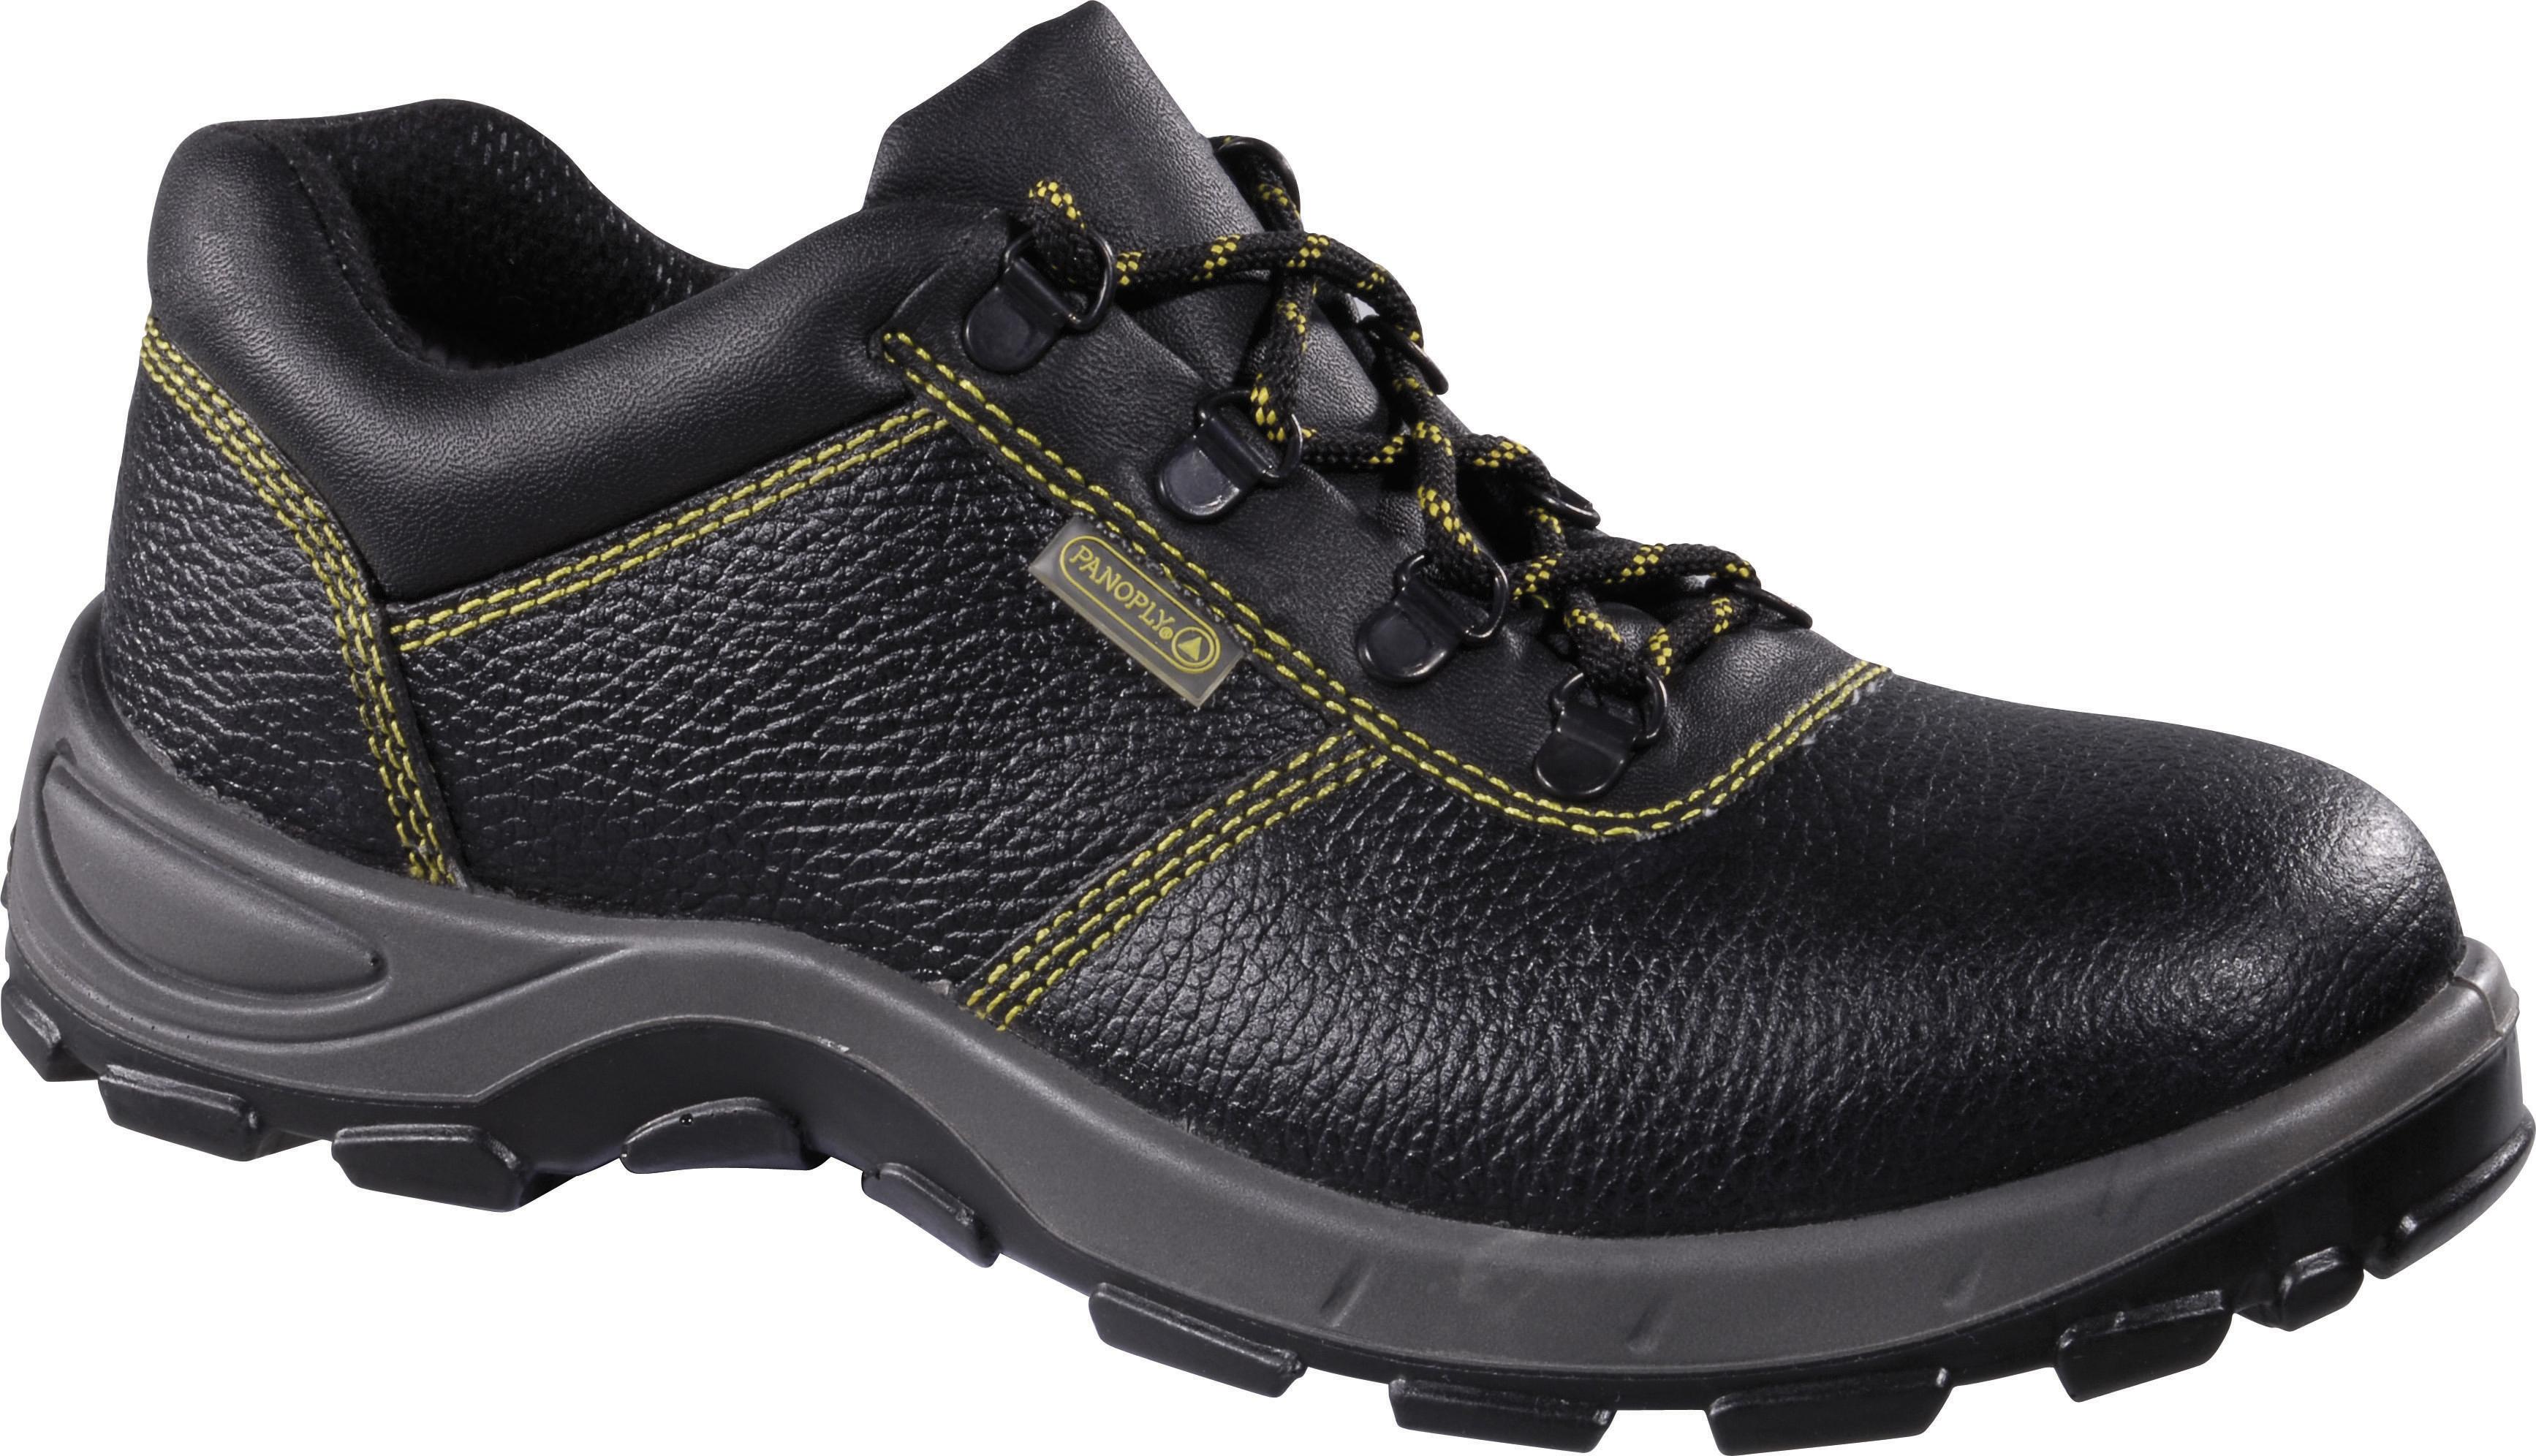 pracovná obuv - Internetový obchod Michel - ESHOP 53b5b6d25f9